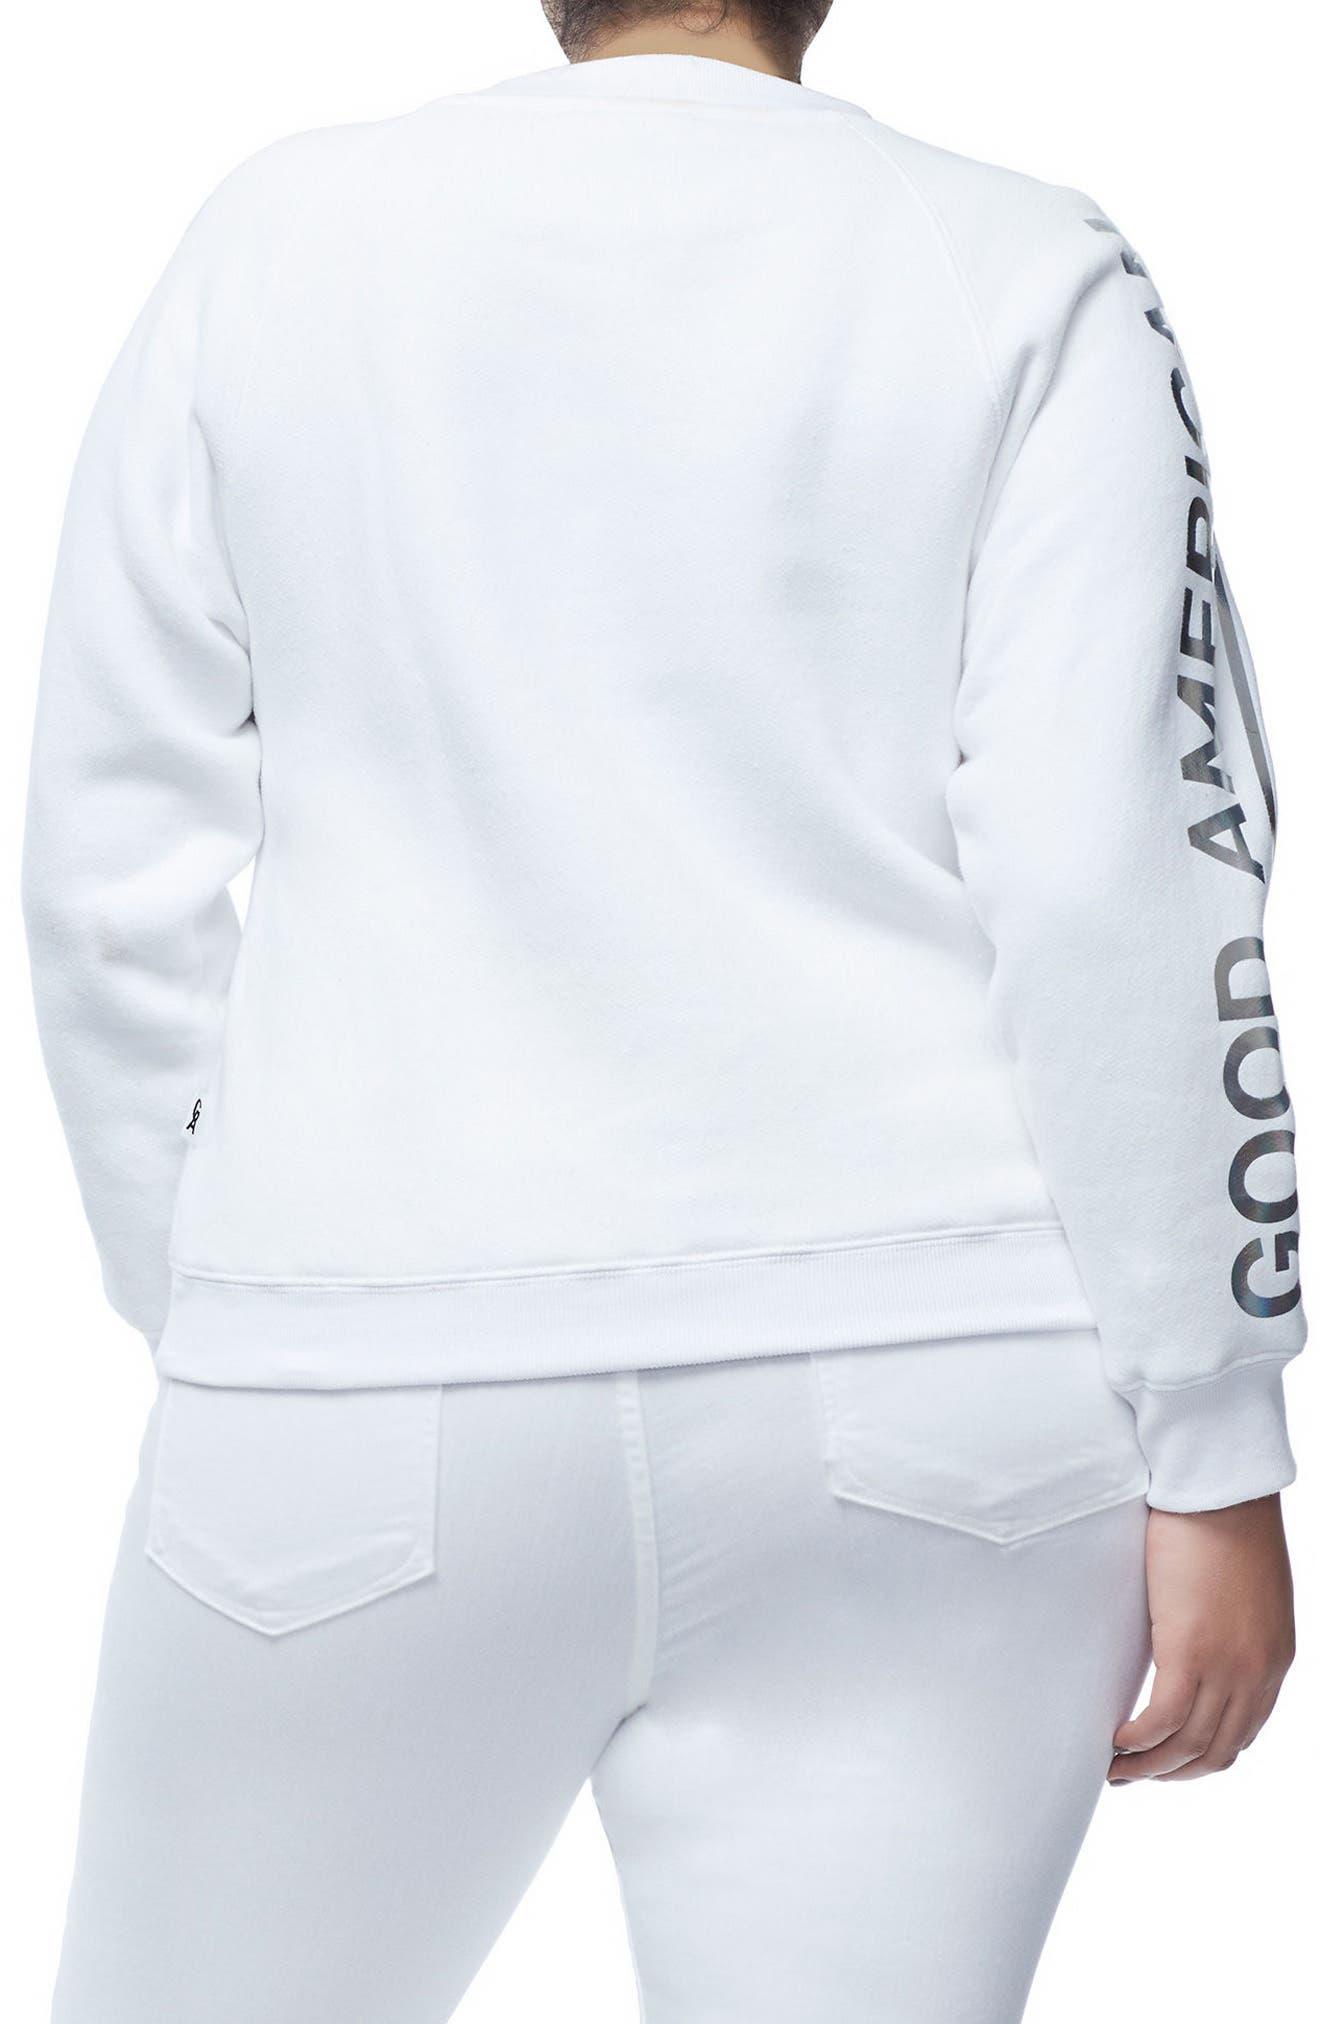 Crewneck Sweatshirt,                             Alternate thumbnail 4, color,                             WHITE